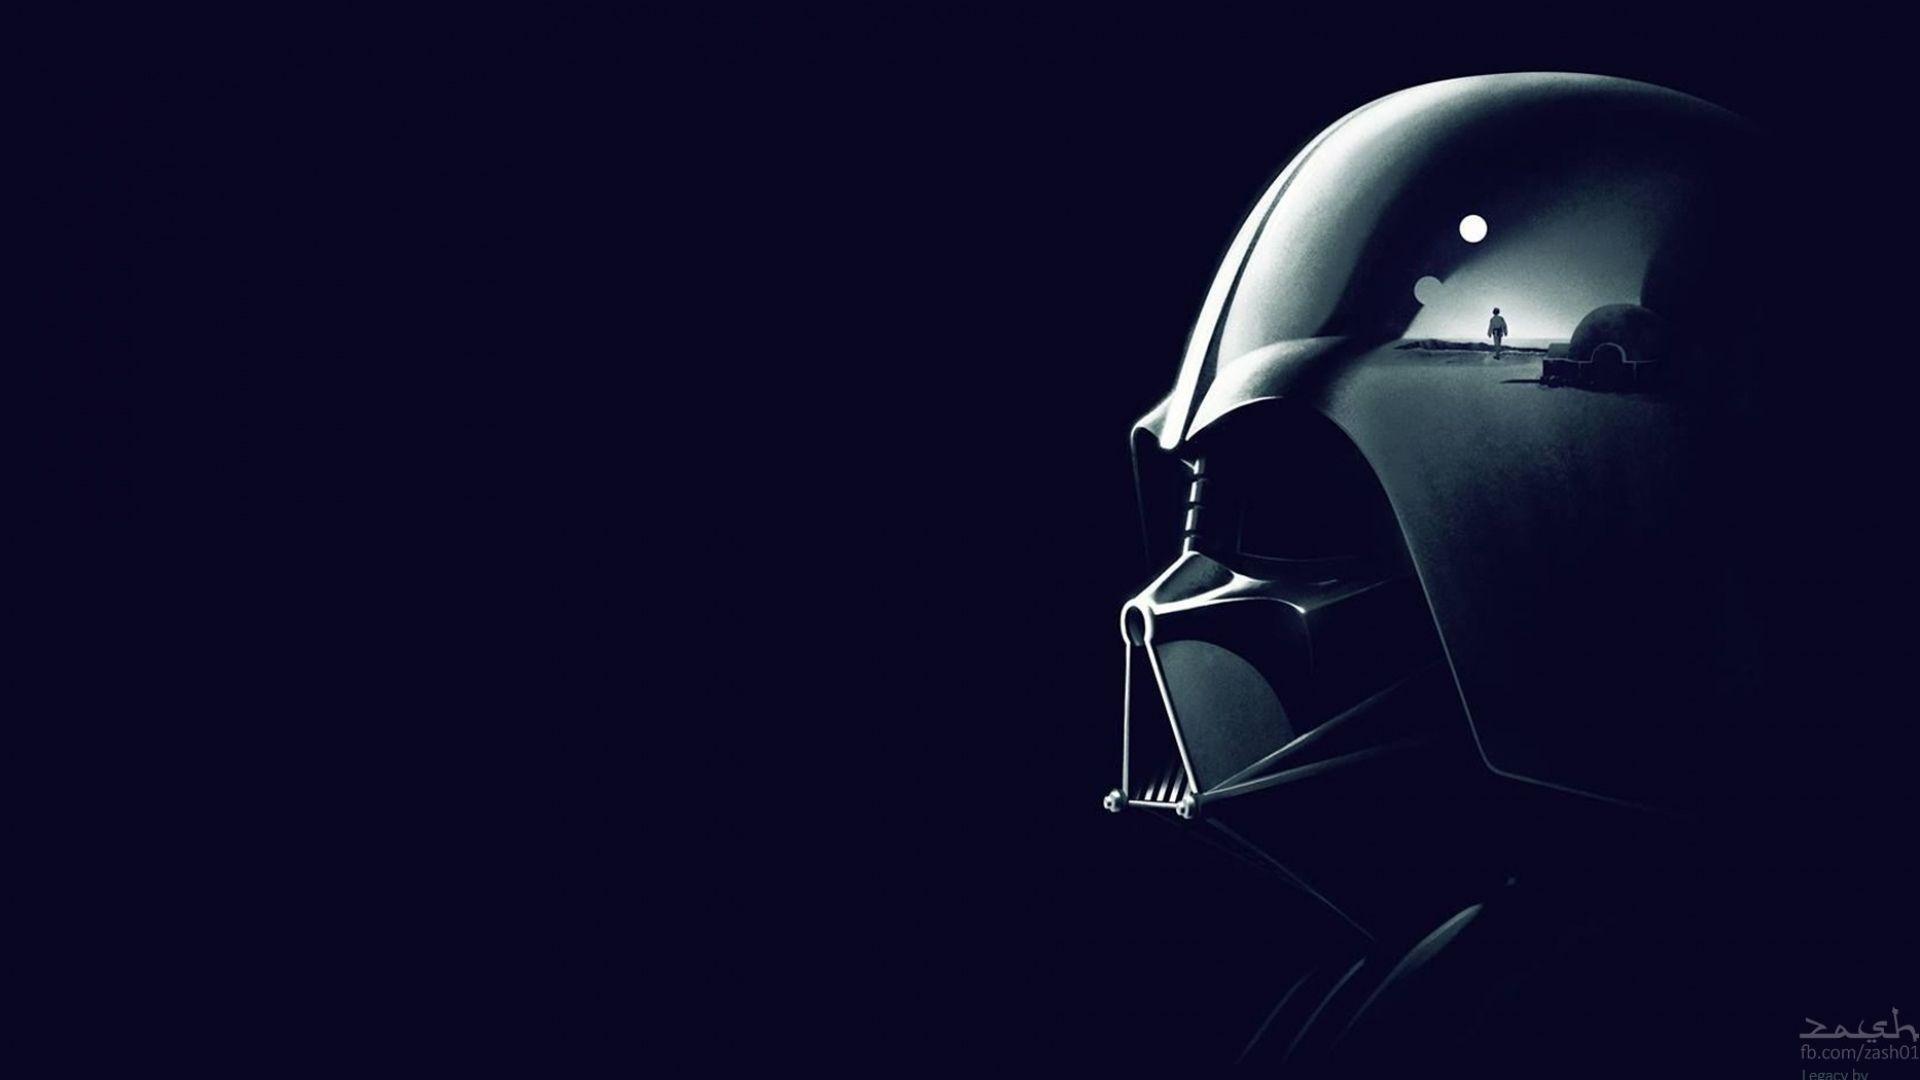 4k 16 9 Star Wars Wallpapers Top Free 4k 16 9 Star Wars